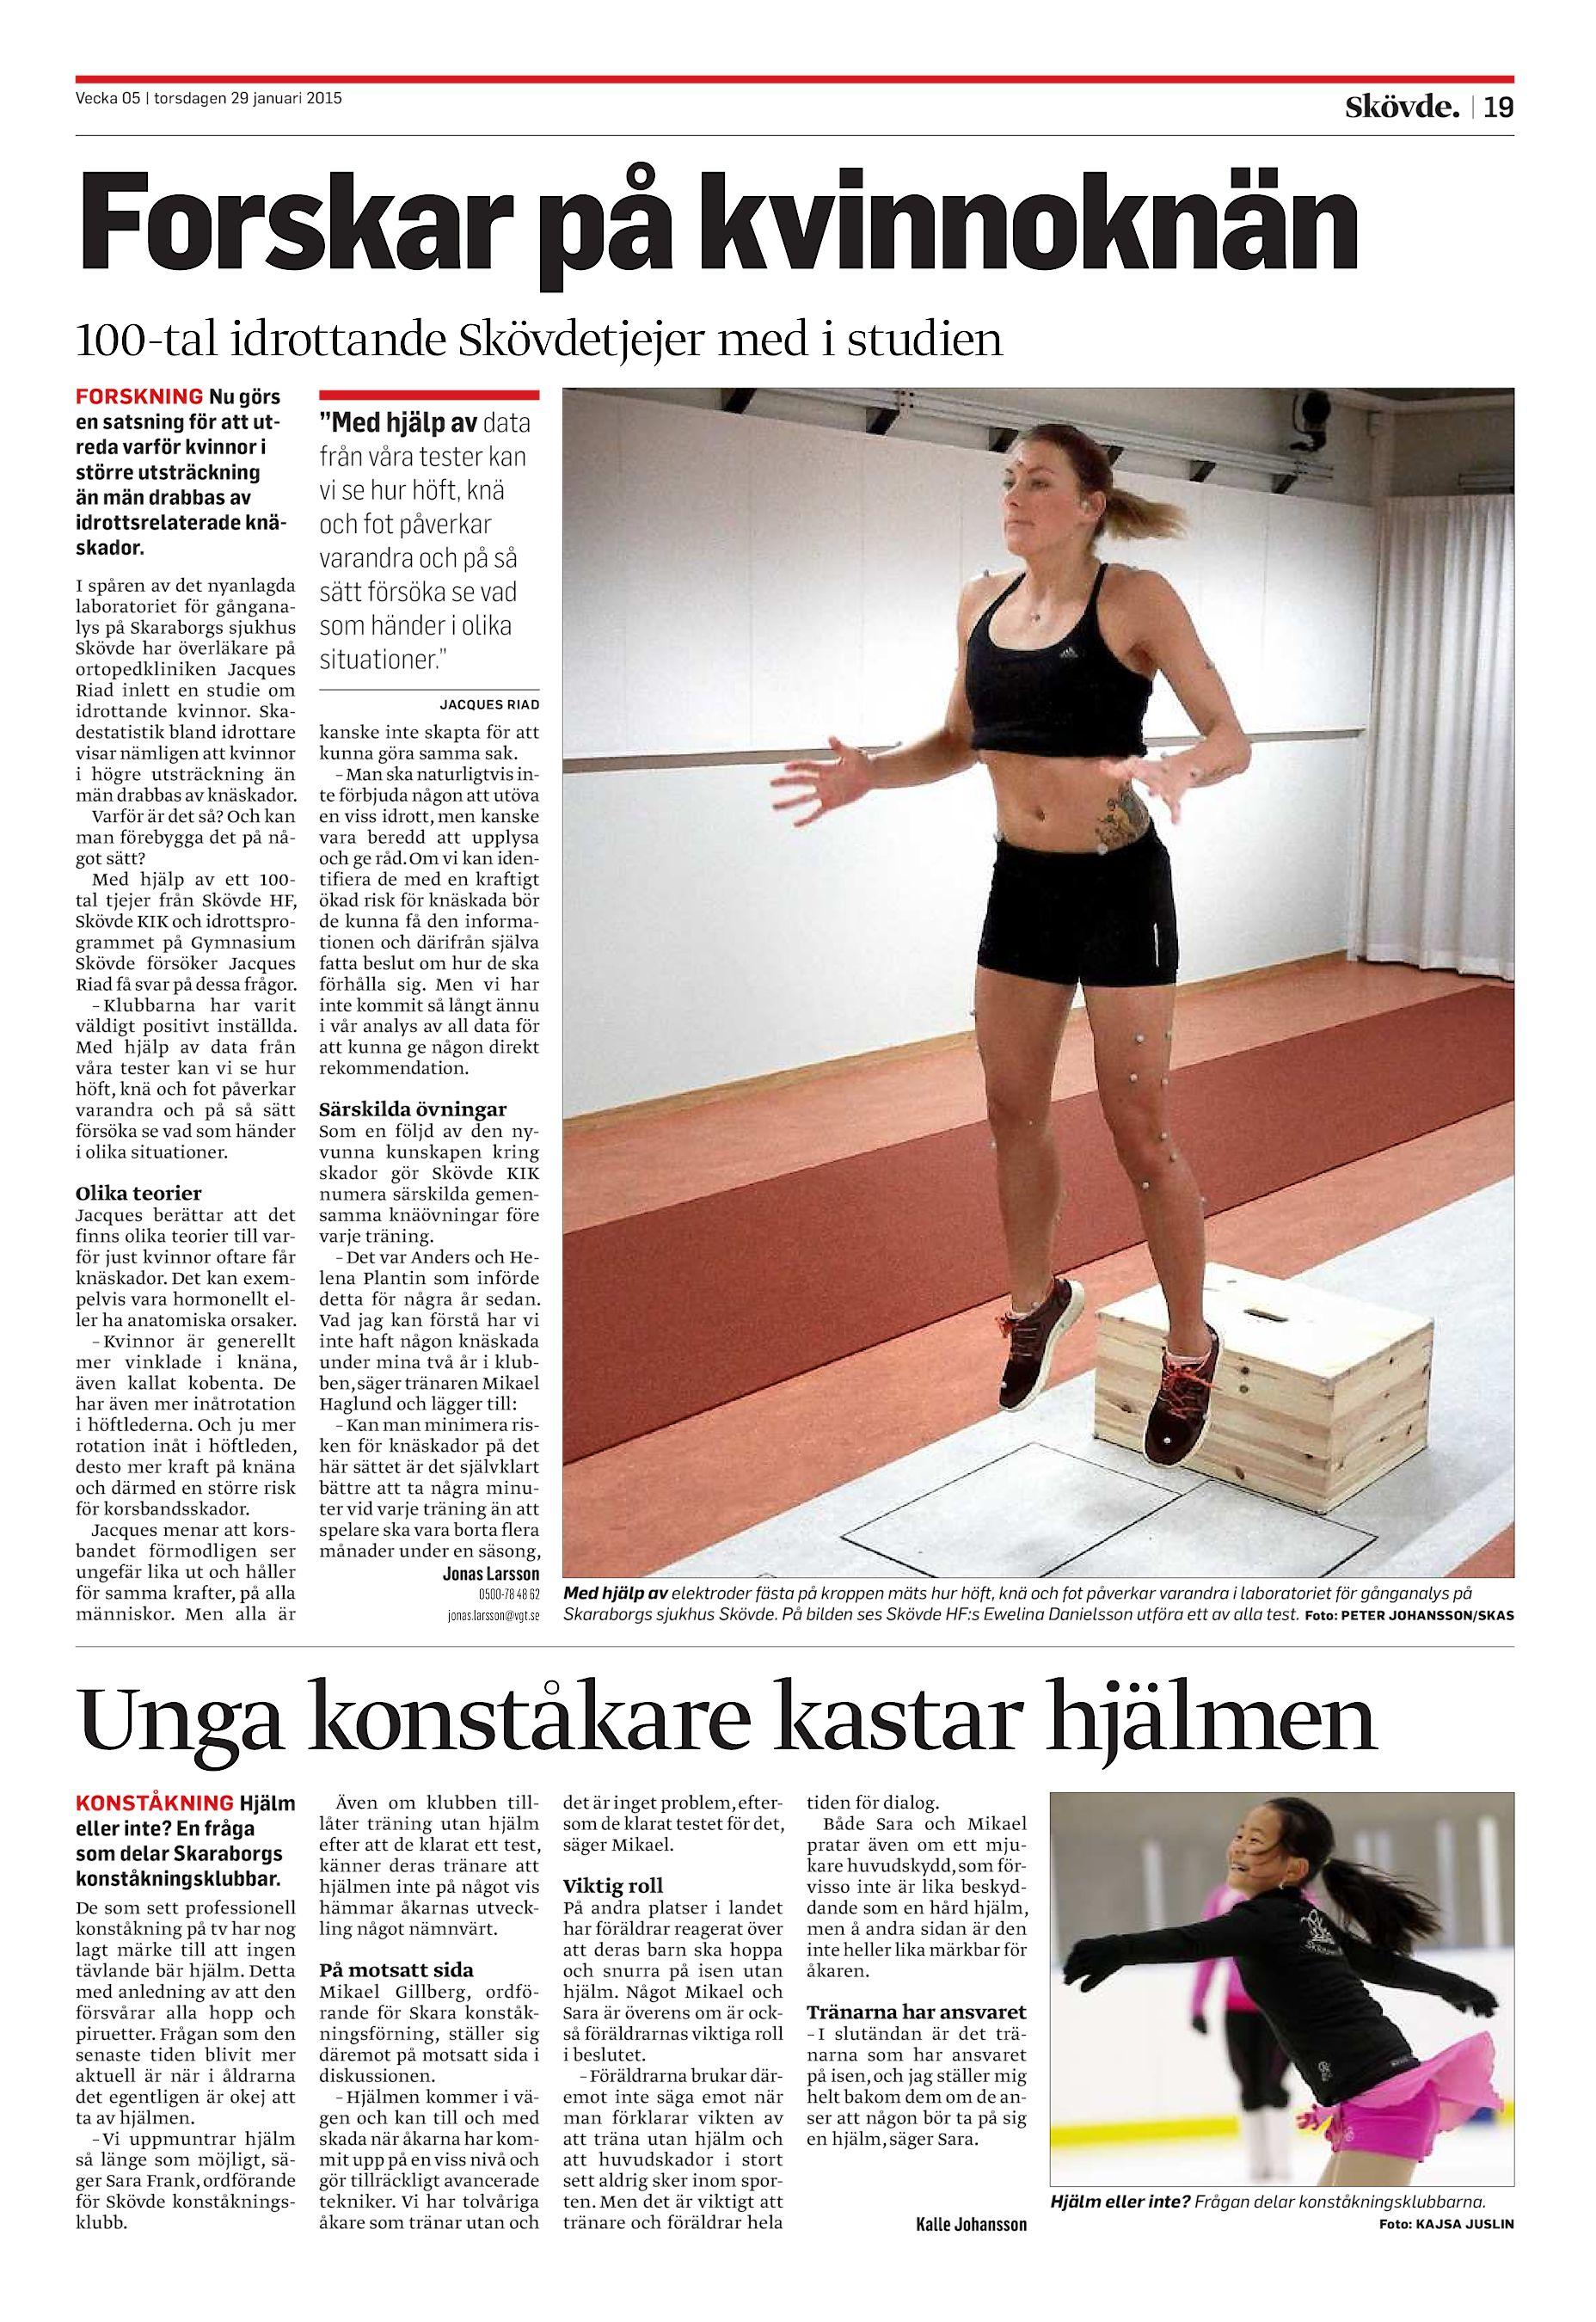 Birgitta Fredriksson, Frsve Backgrden 8, Skvde | patient-survey.net